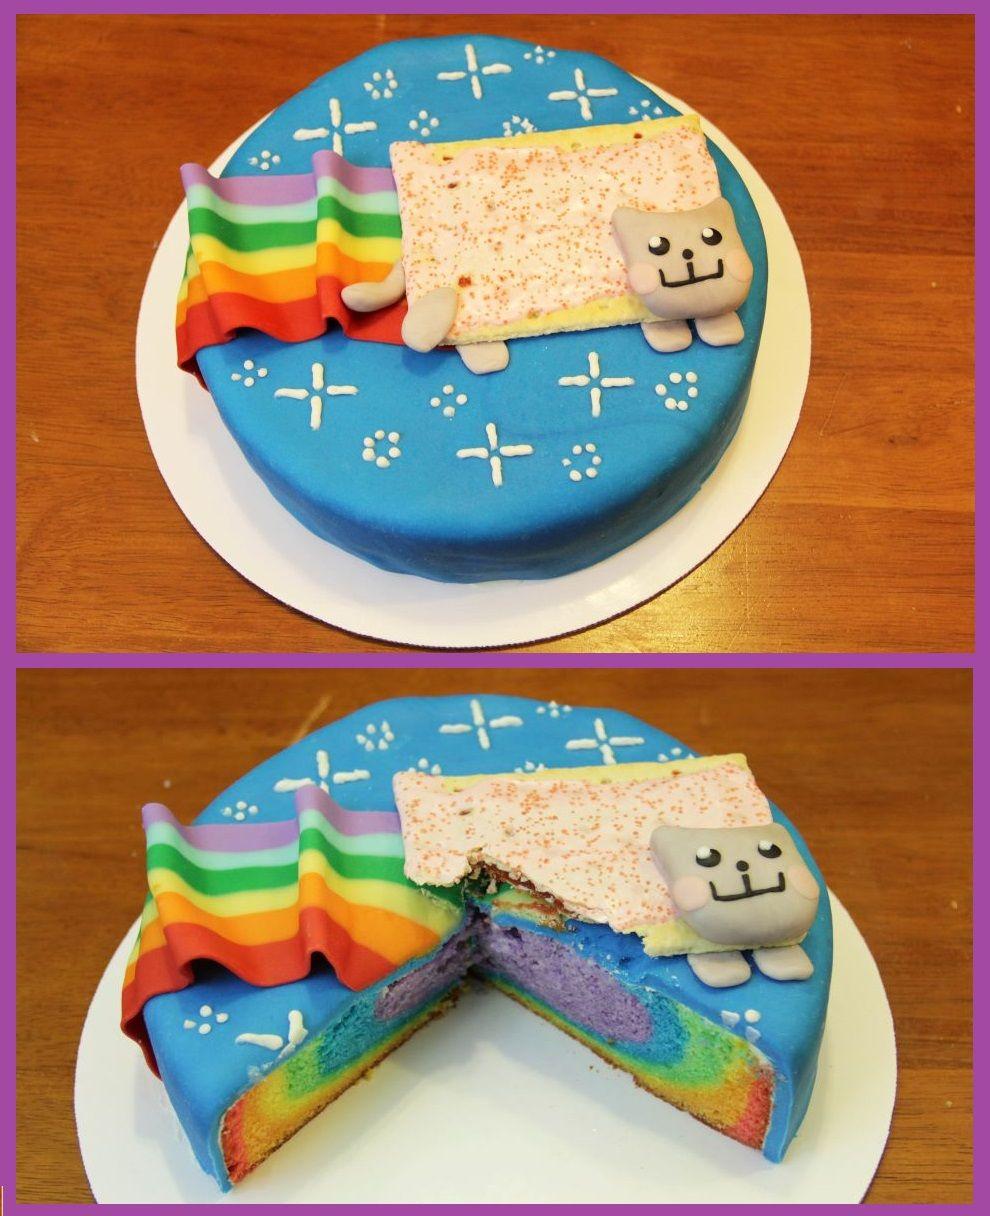 nyan cat rainbow cake by rosanna pansino http://youtu.be ...